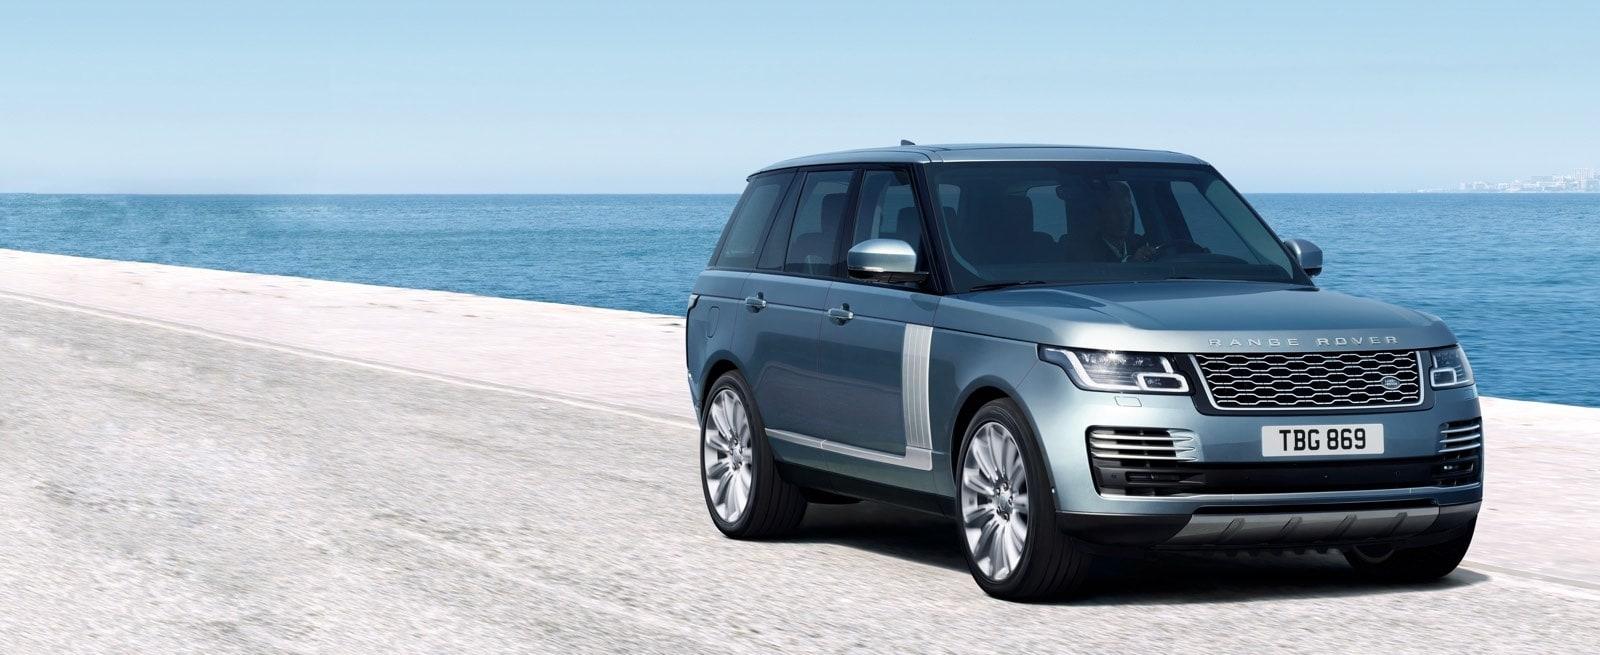 Blue Range Rover Driving along a beachfront